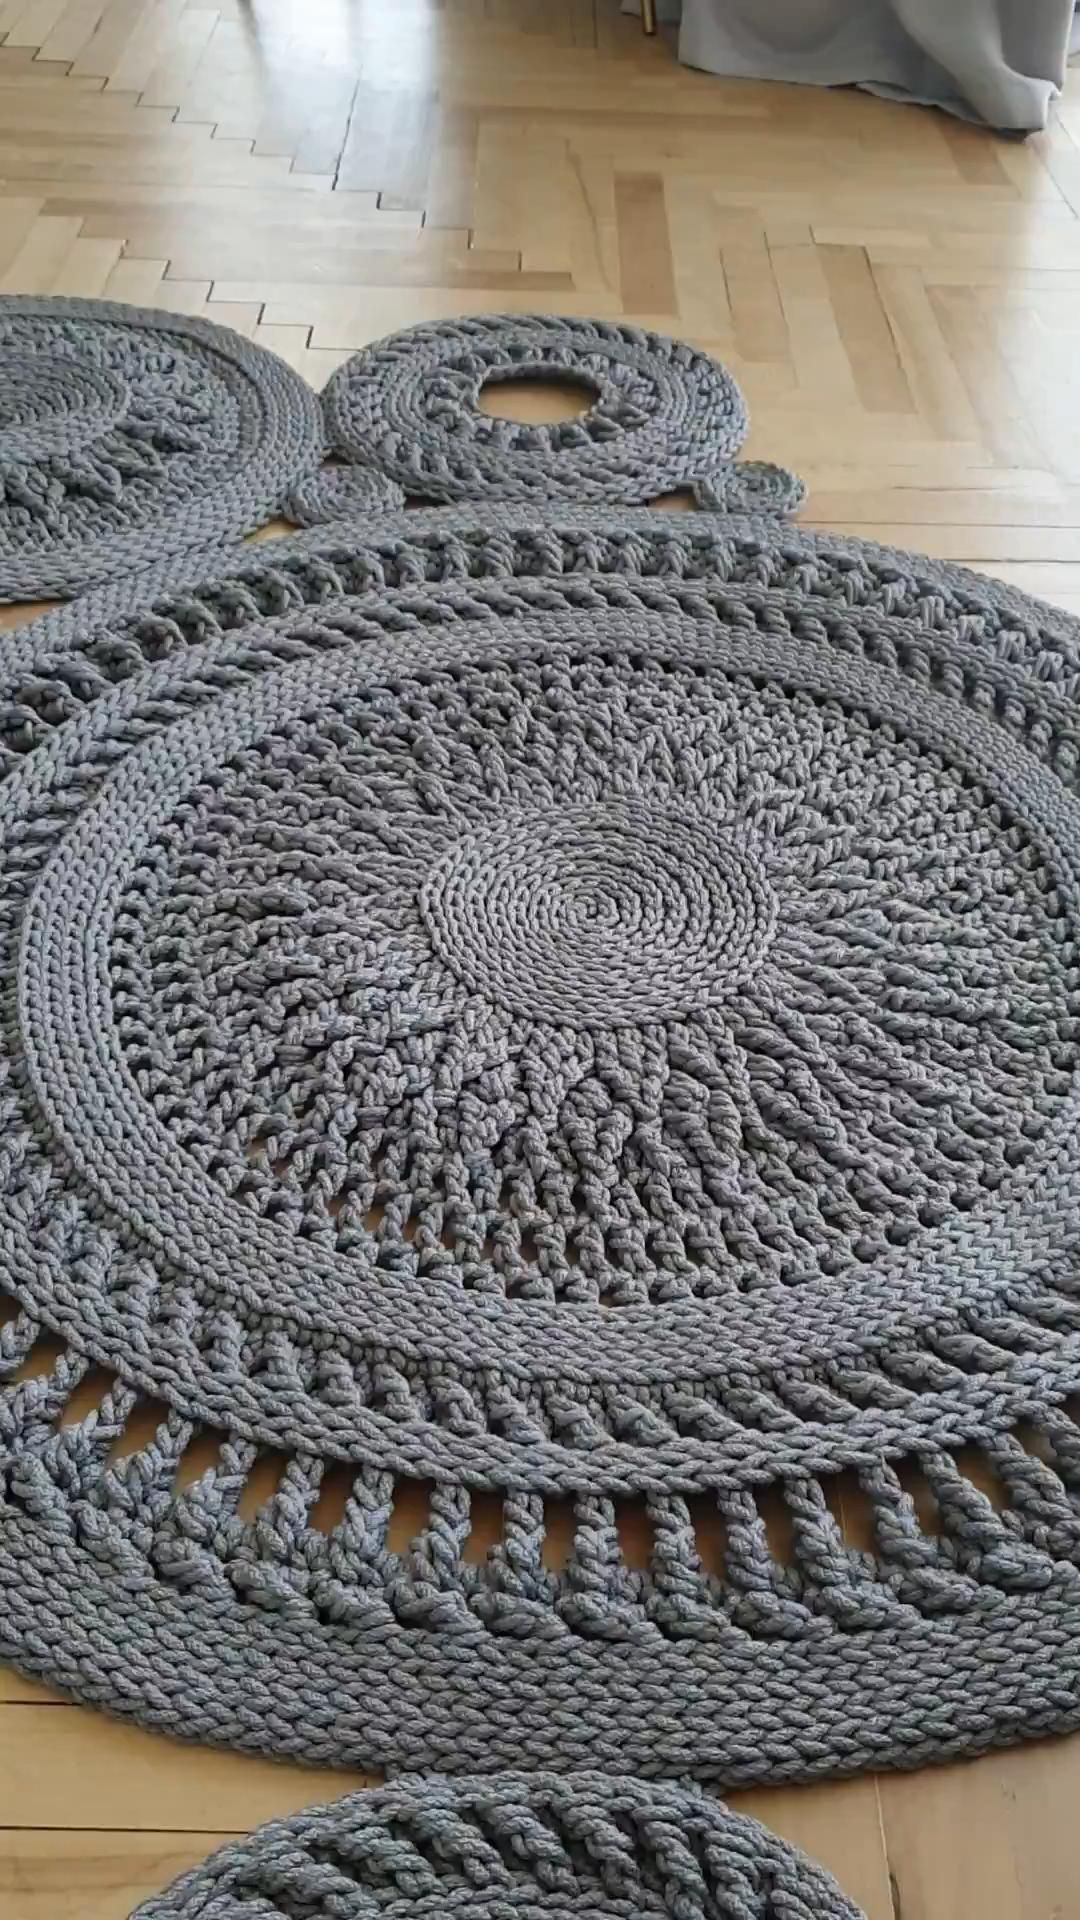 Crochet rug pattern. Craft home decor